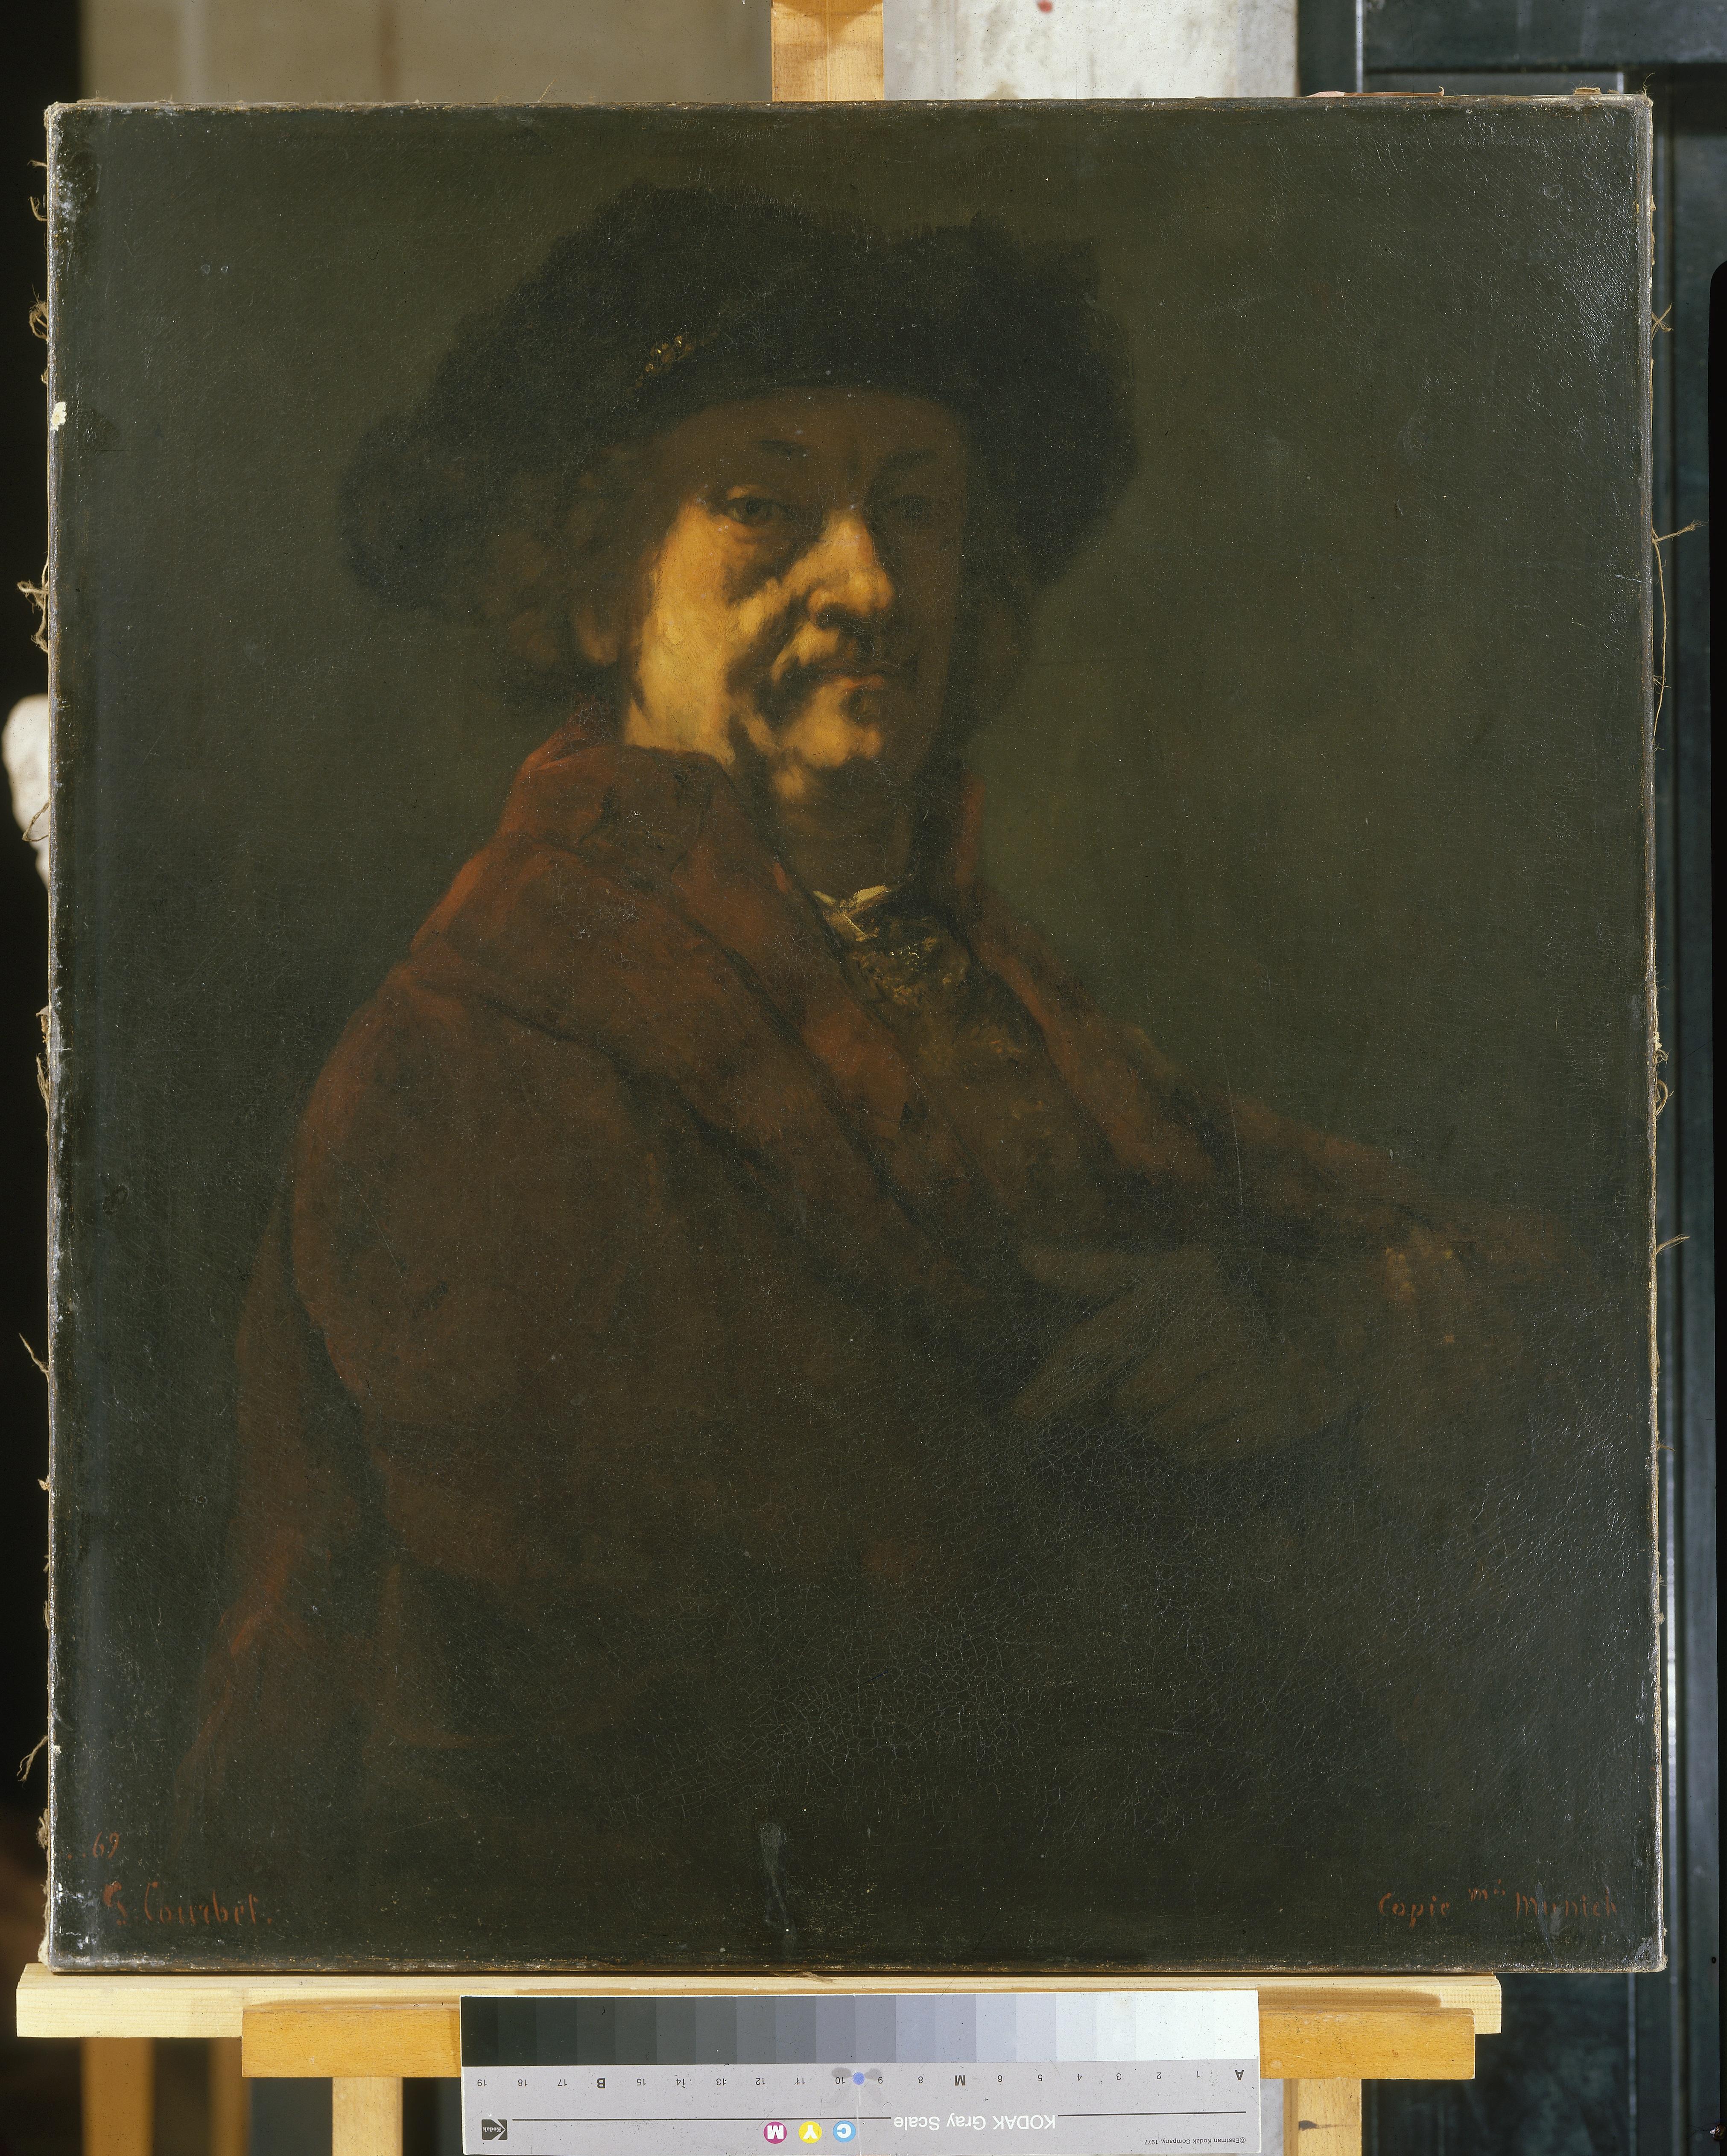 mnr/MNR00190/MNR190-copyright-Musee_des_beaux-Arts_et_d_archeologie_photo_Charles_Choffet-inv-D-953-1-8-face.jpg